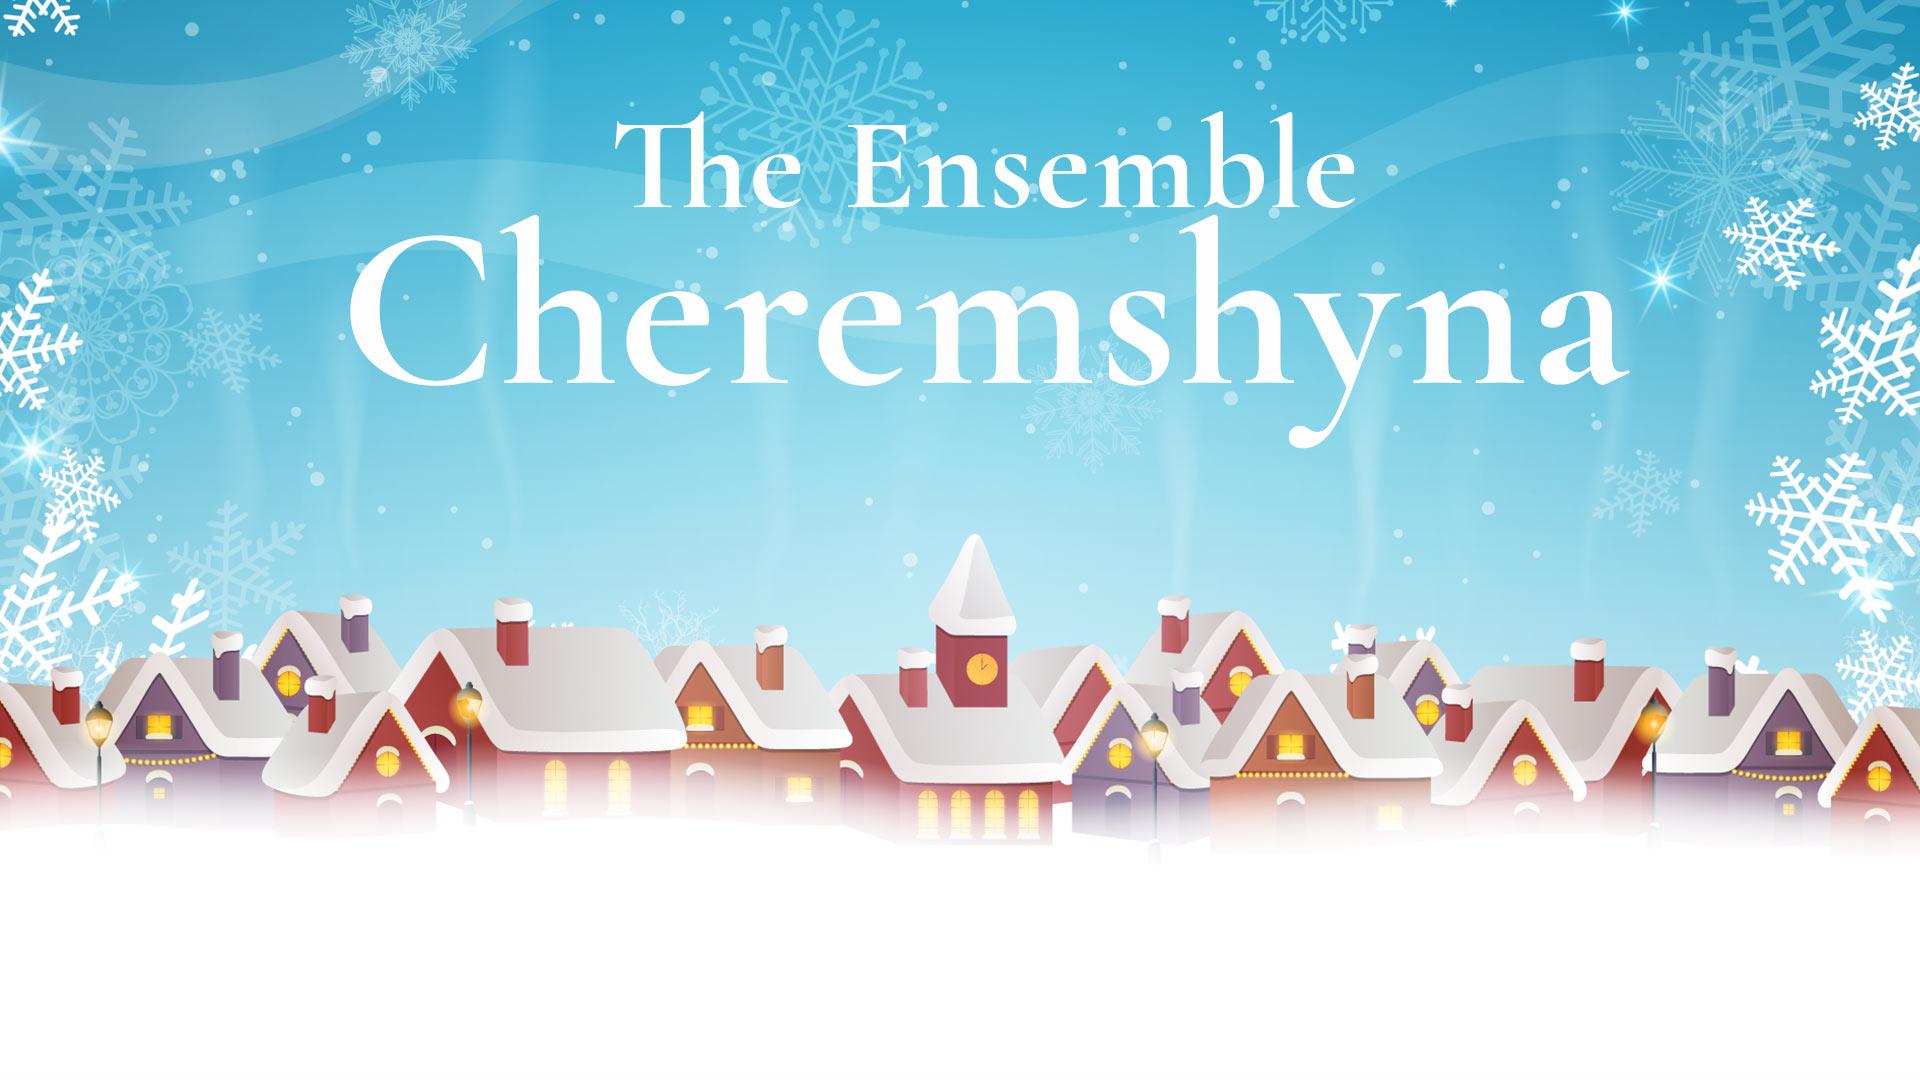 Christmas-Carols-The-Ensemble-Cheremshyna